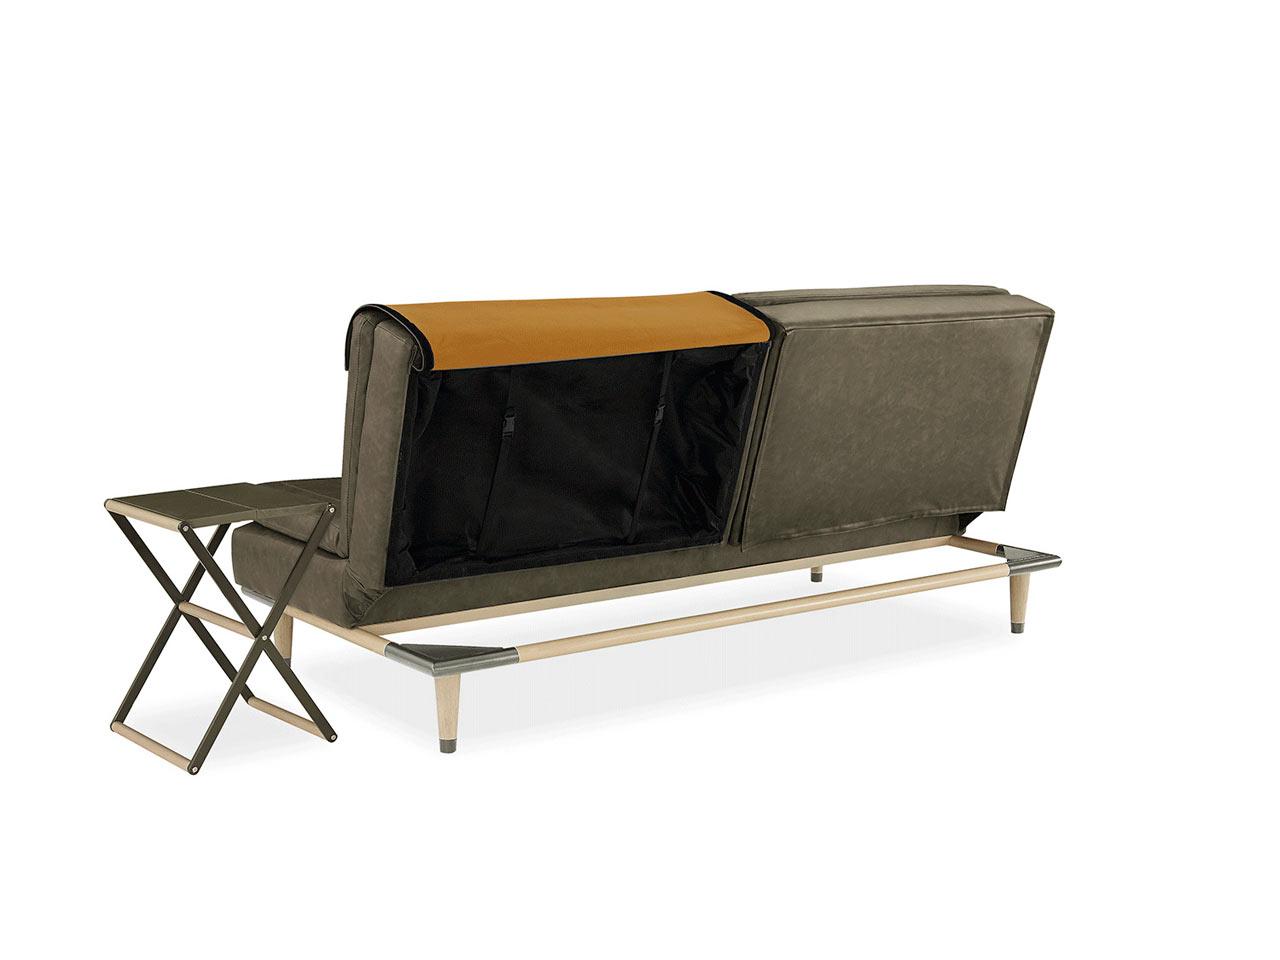 A Convertible Sofa That Hides a Table